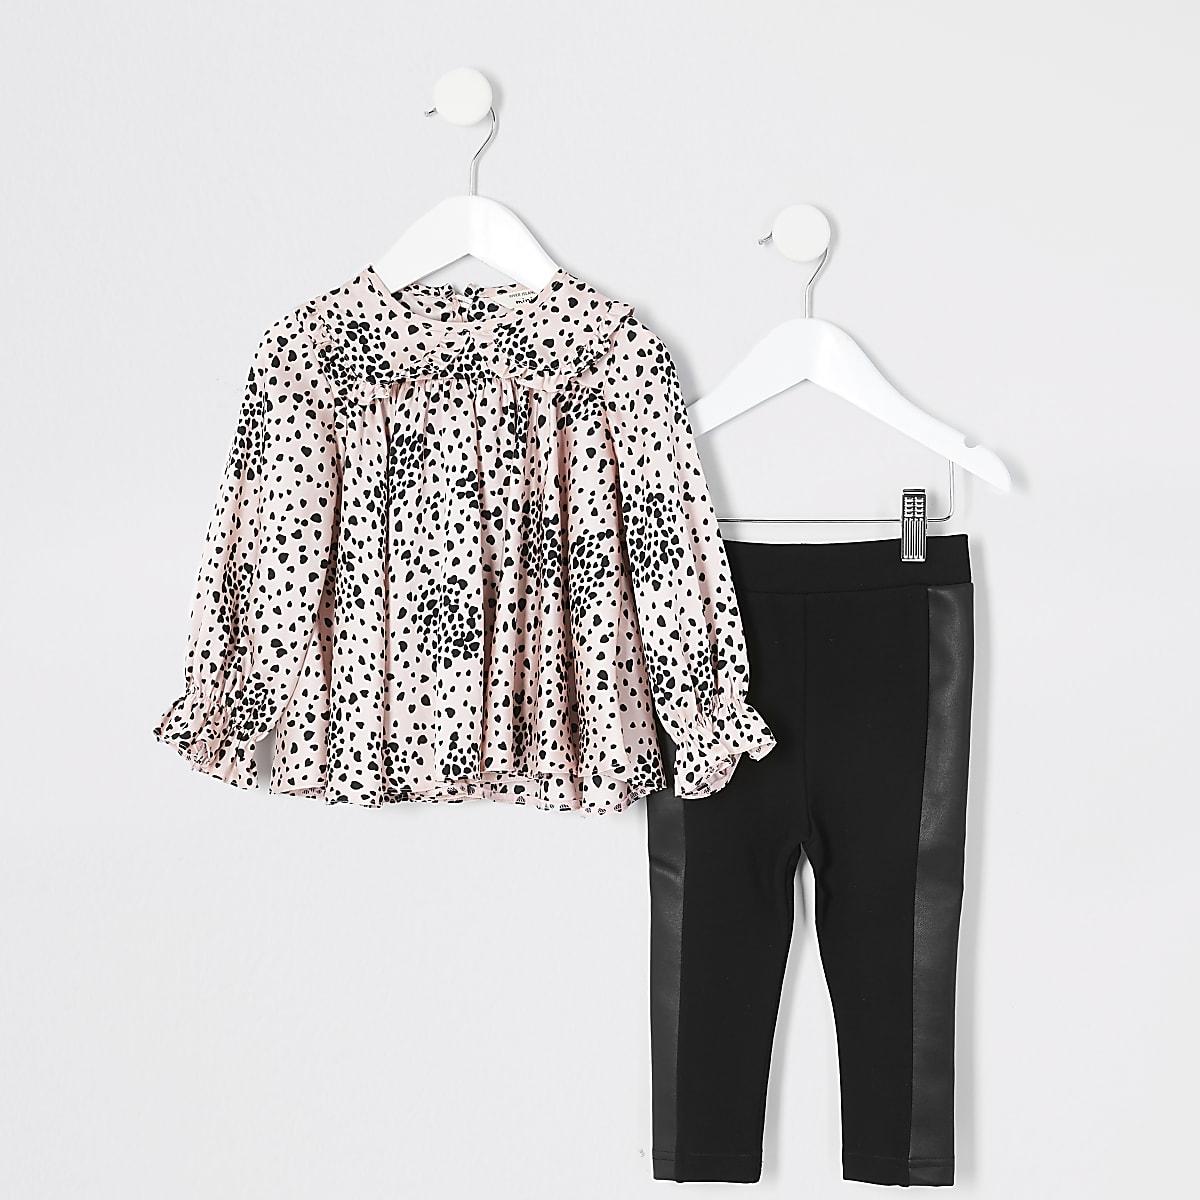 Mini - Roze blouse outfit met print en ruches voor meisjes